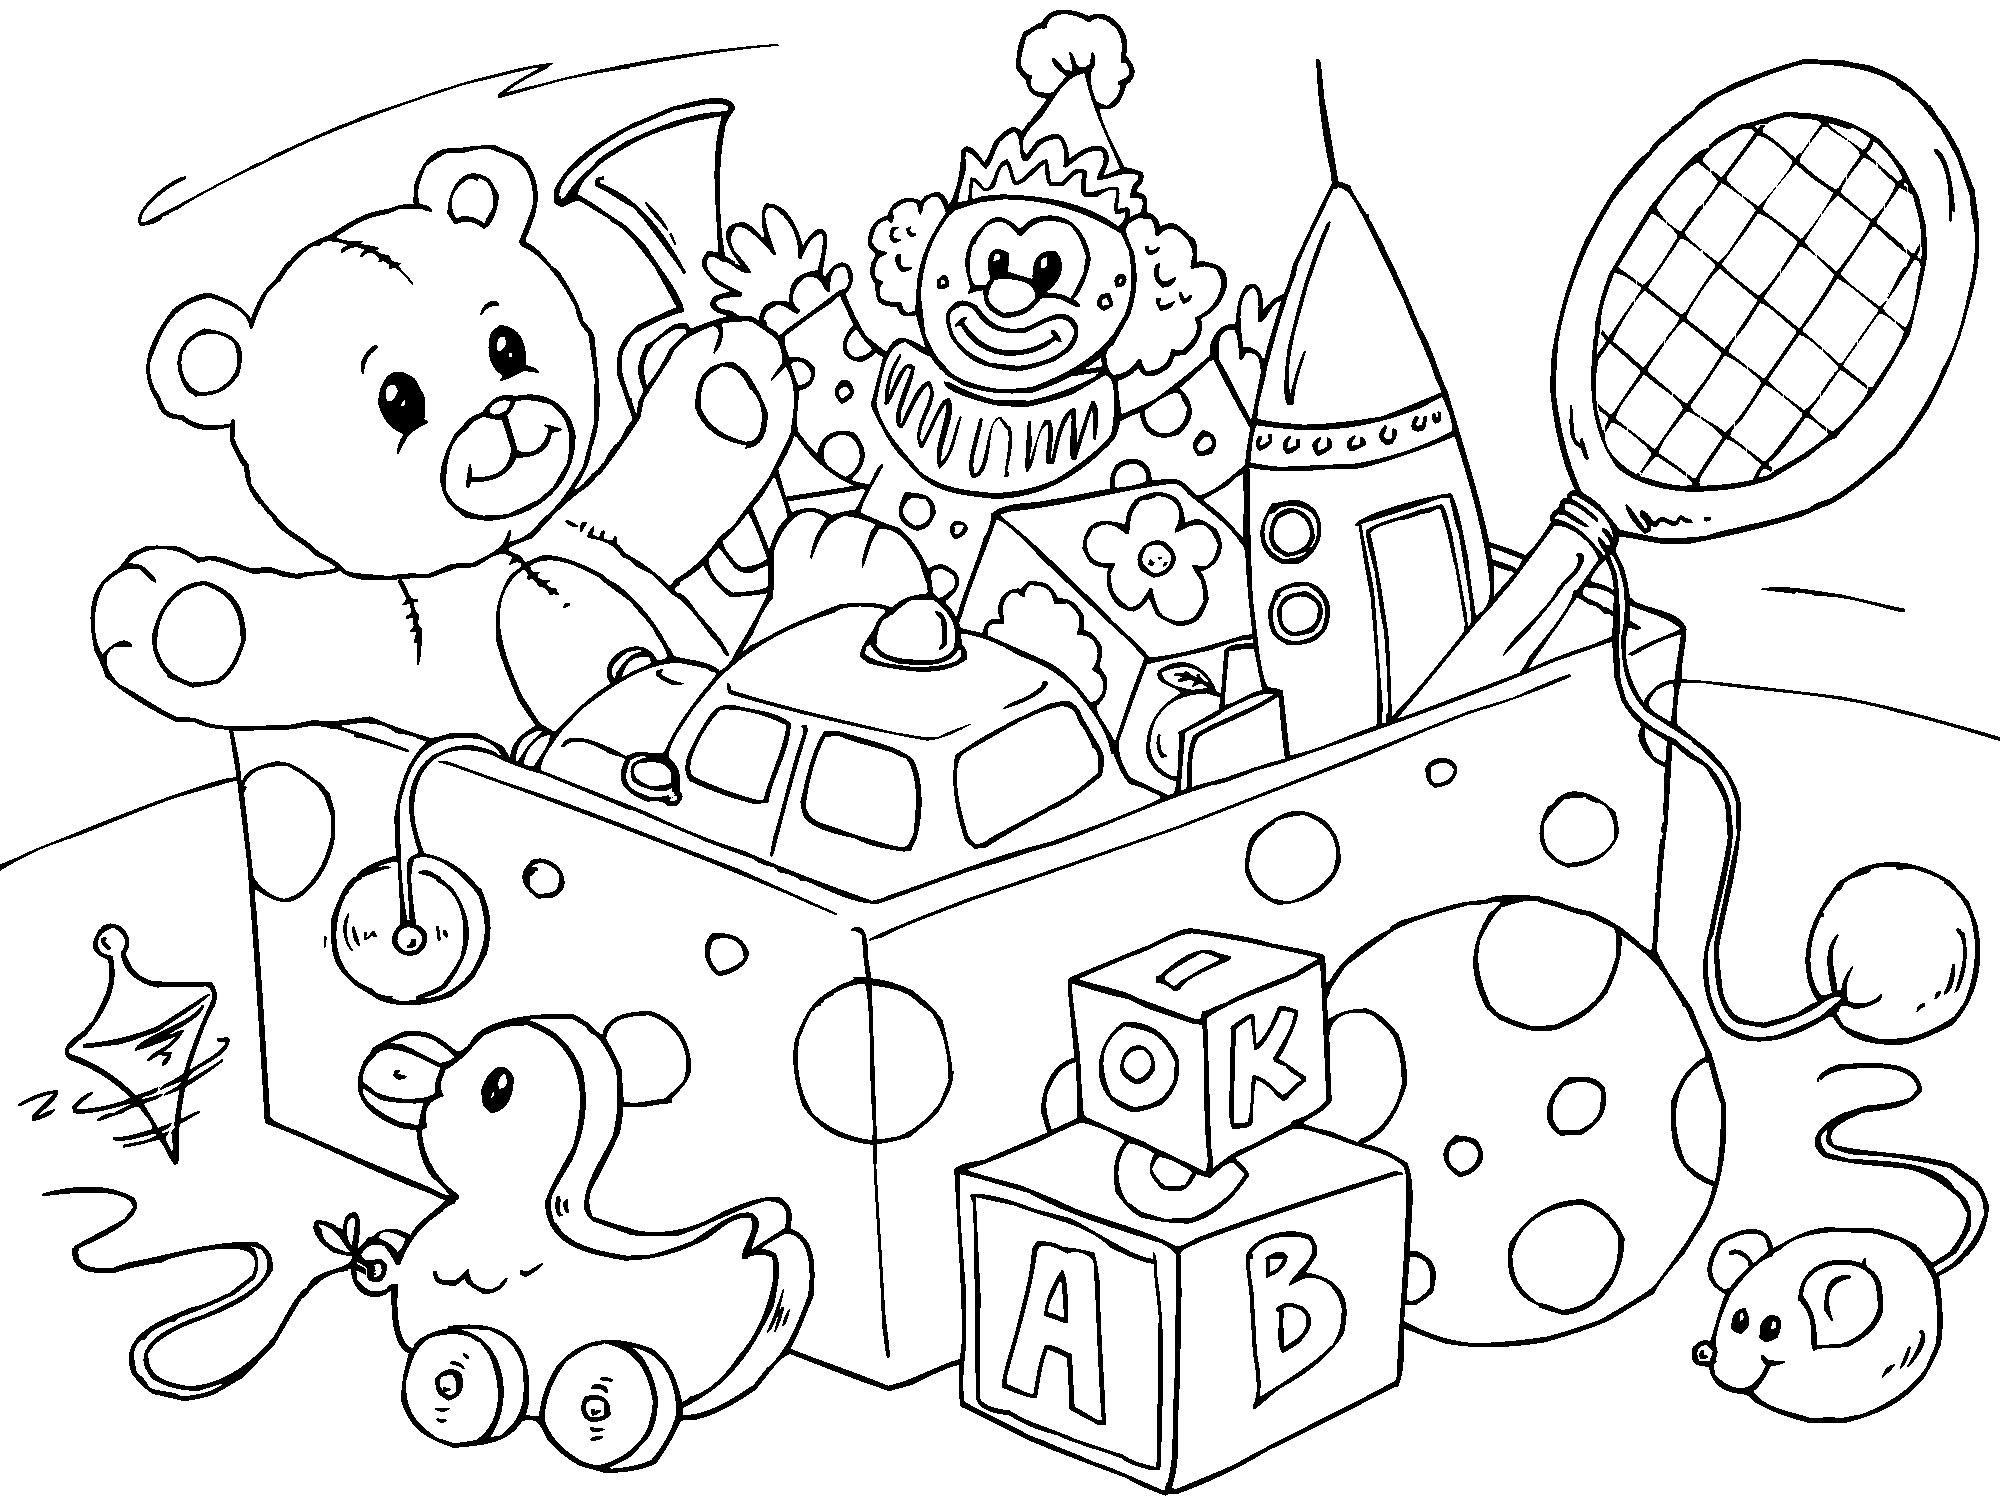 Dibujo para colorear juguetes - Img 22821